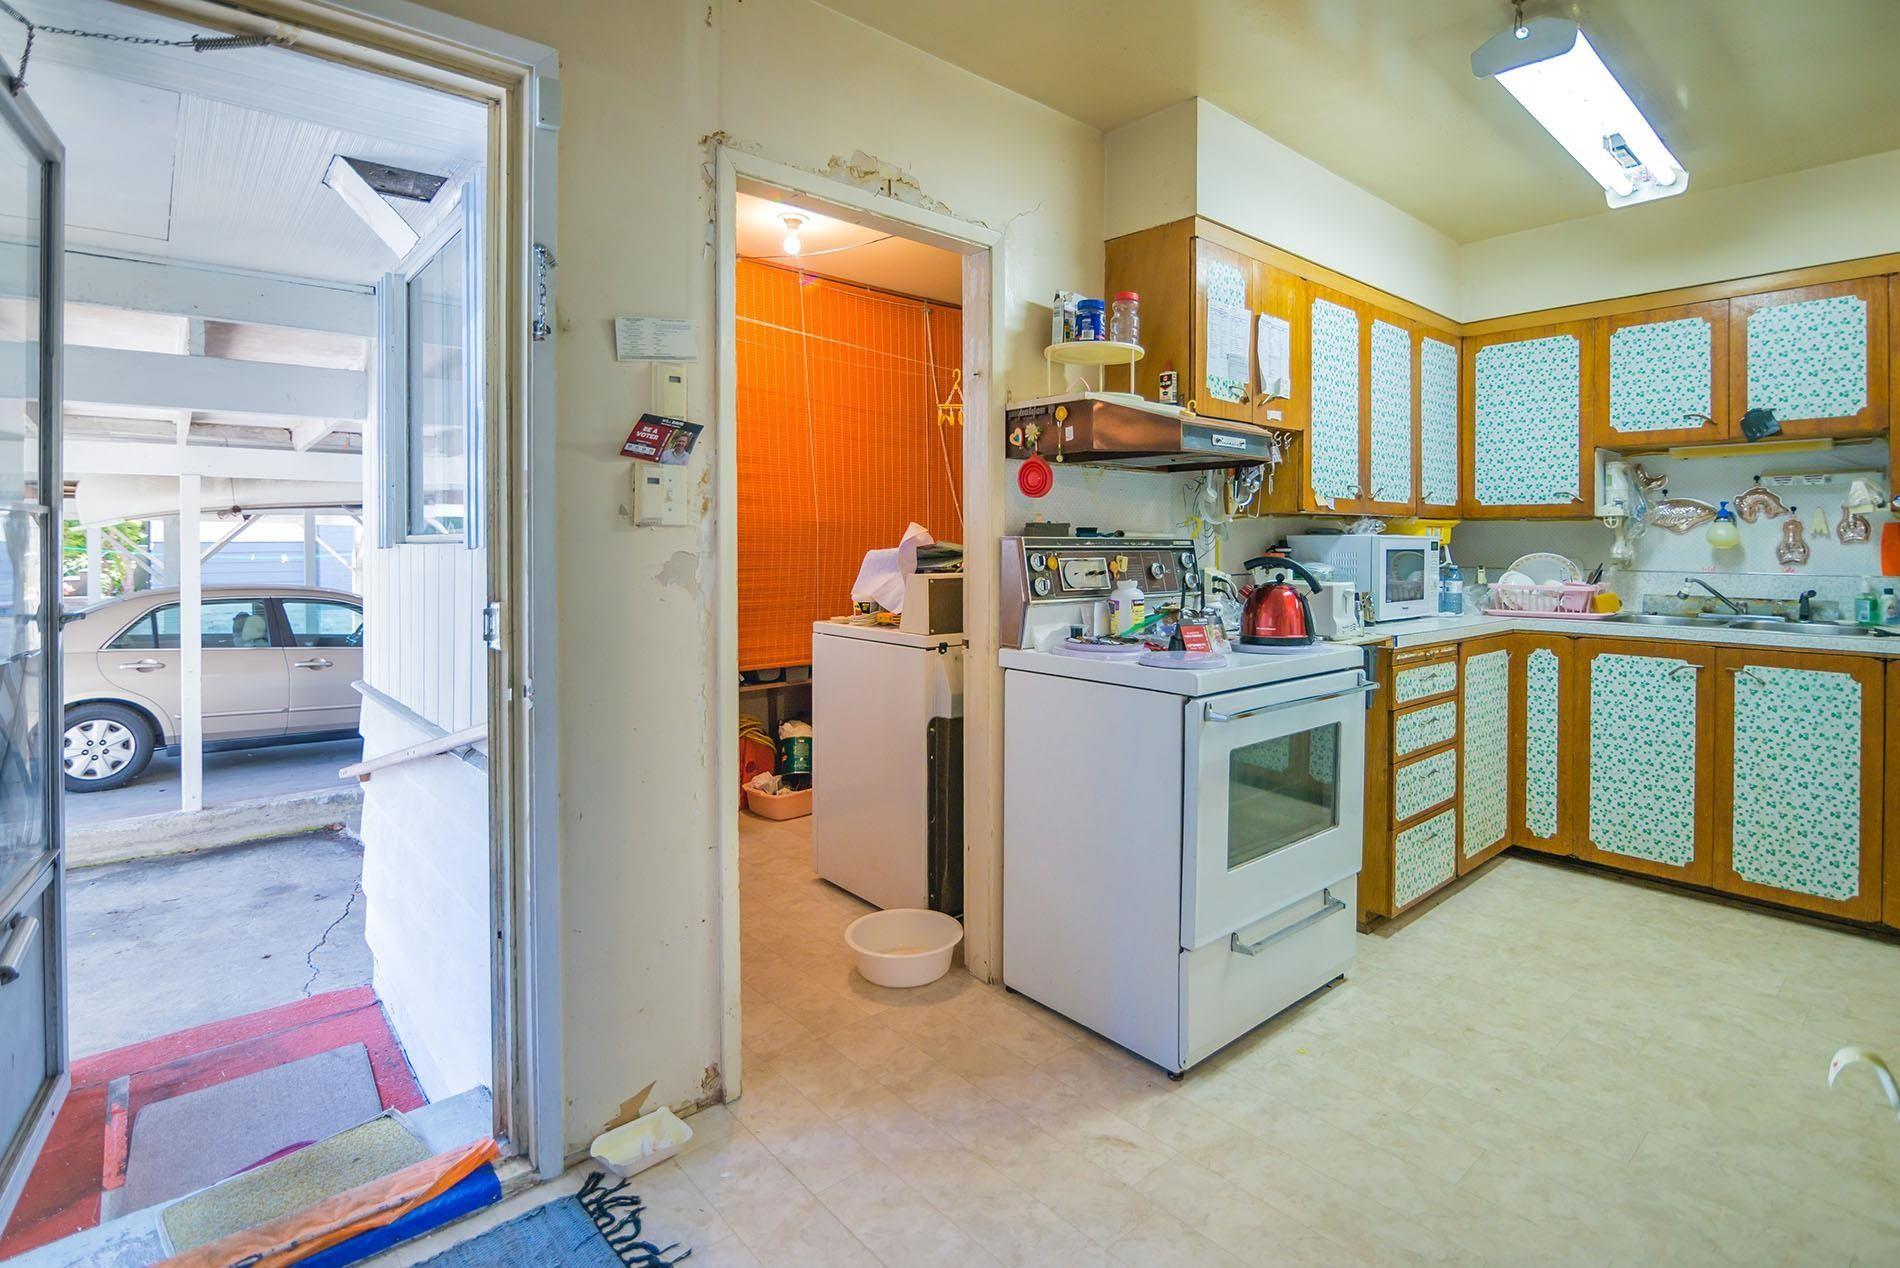 Main Photo: 2110 REGAN Avenue in Coquitlam: Central Coquitlam House for sale : MLS®# R2621635